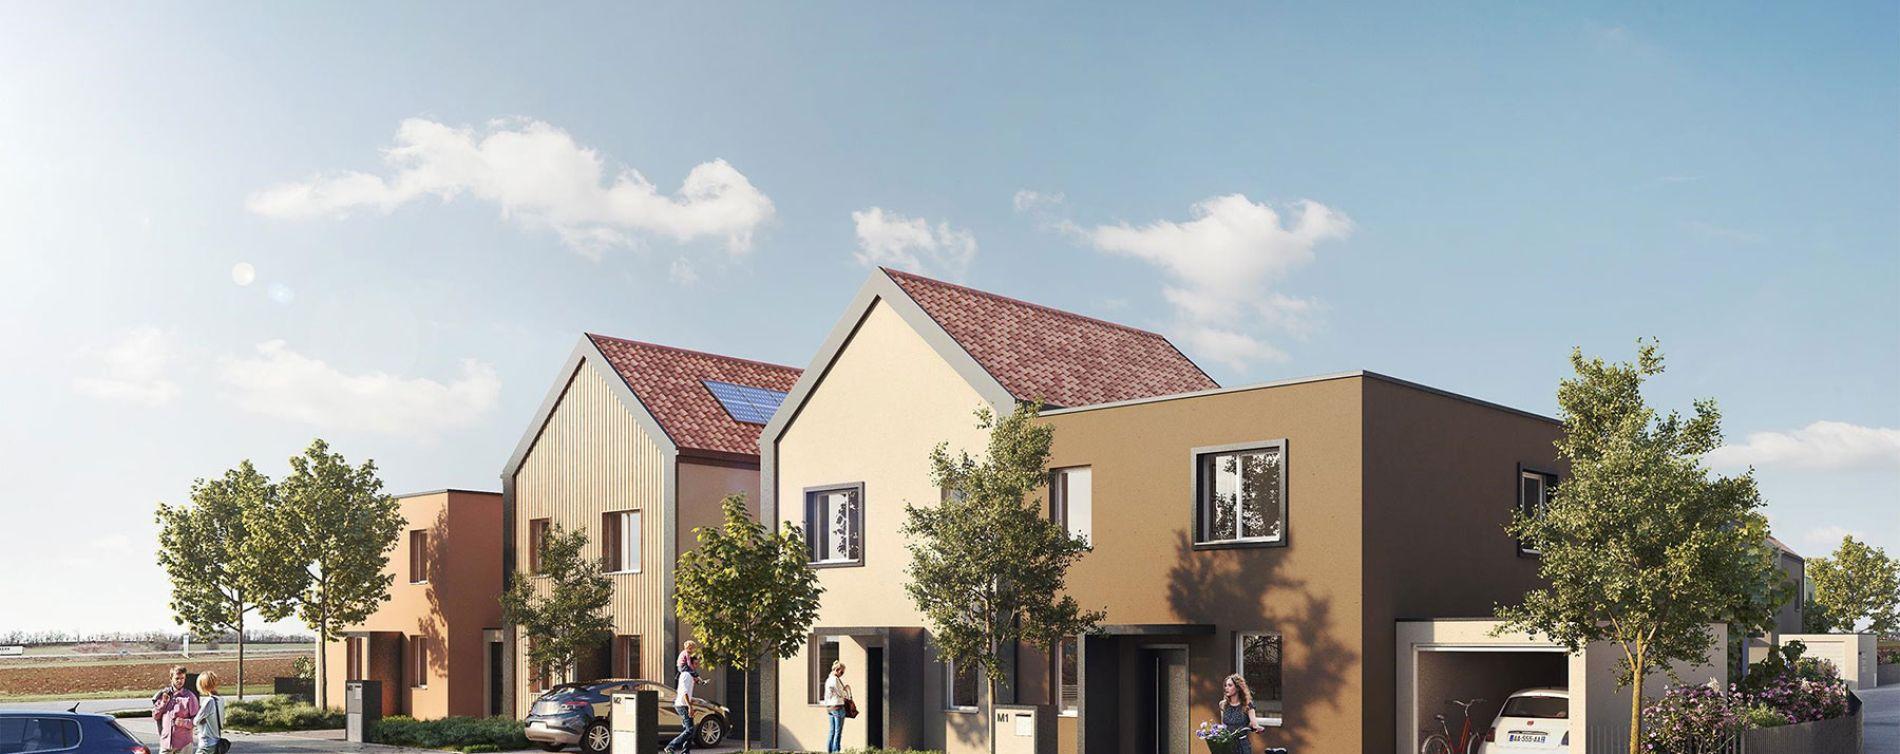 Geispolsheim : programme immobilier neuve « L'Empreinte » en Loi Pinel